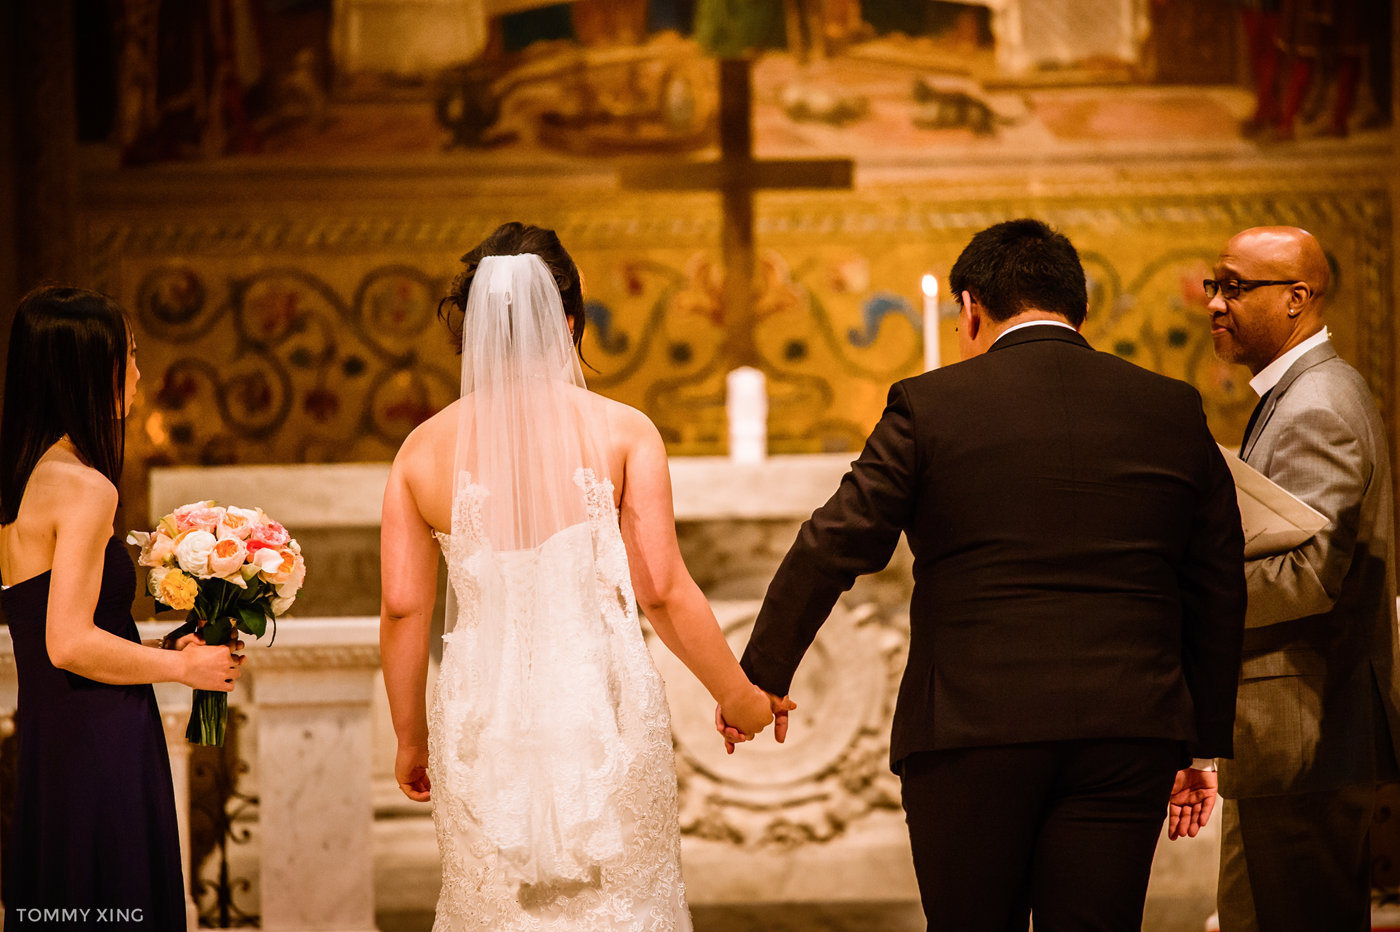 STANFORD MEMORIAL CHURCH WEDDING - Wenjie & Chengcheng - SAN FRANCISCO BAY AREA 斯坦福教堂婚礼跟拍 - 洛杉矶婚礼婚纱照摄影师 Tommy Xing Photography105.jpg